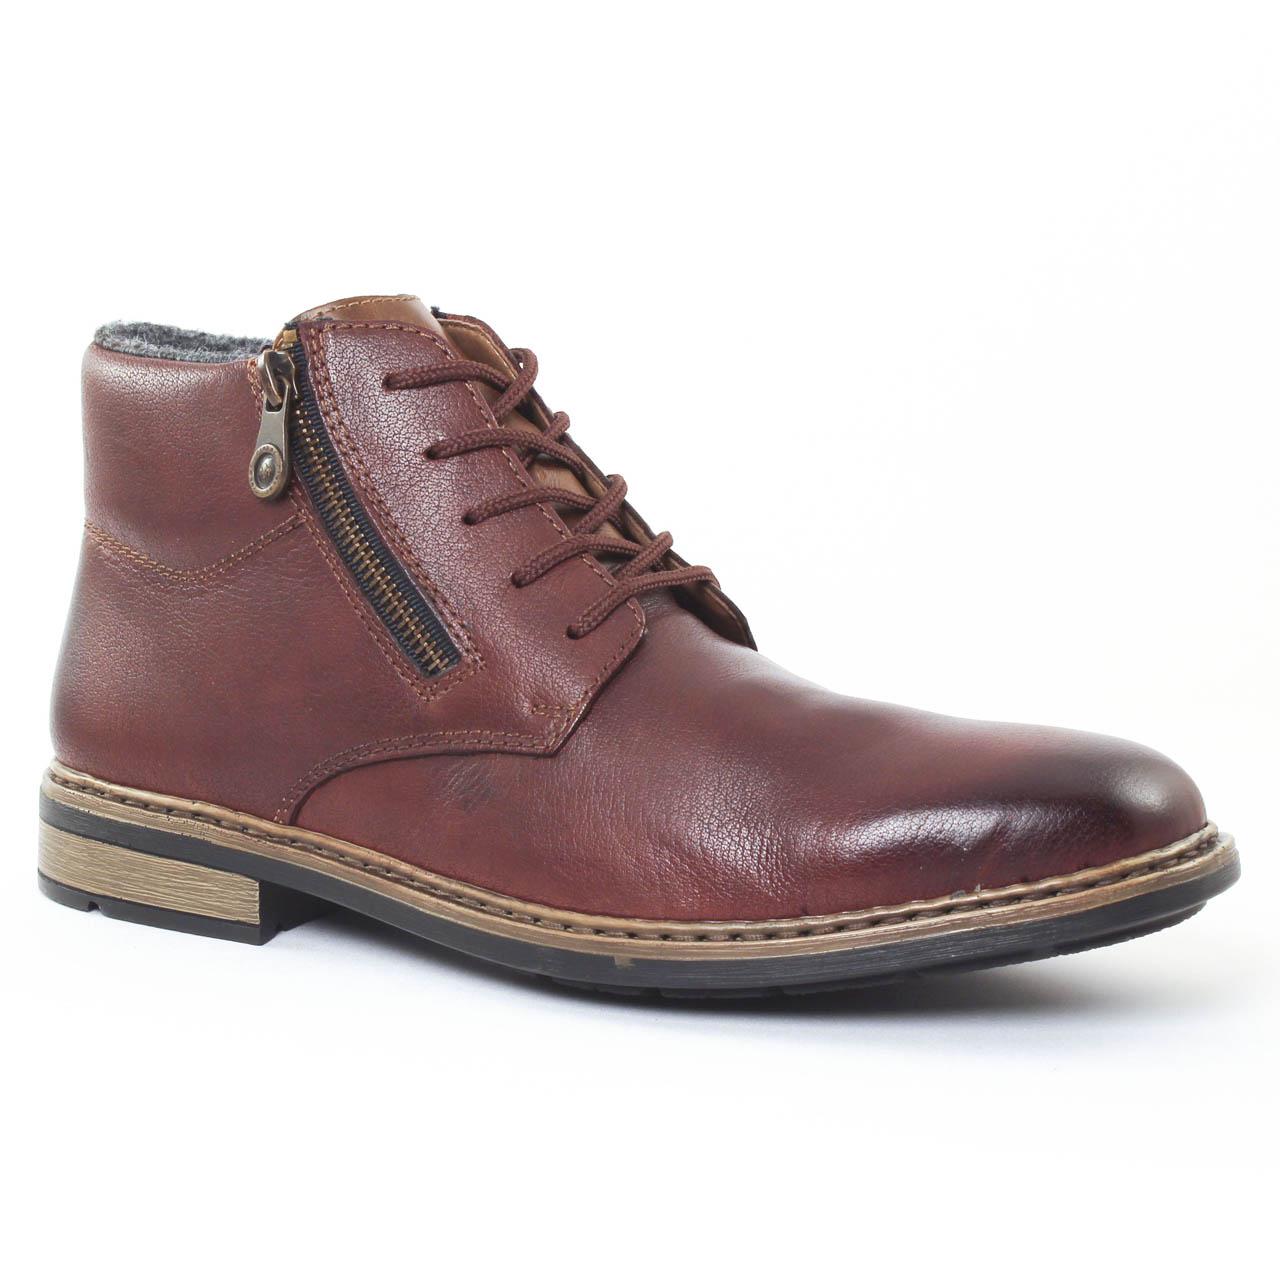 249a3ea2e2b9 chaussure rieker homme pas cher,Chaussure Homme Rieker Killian 05358 ...